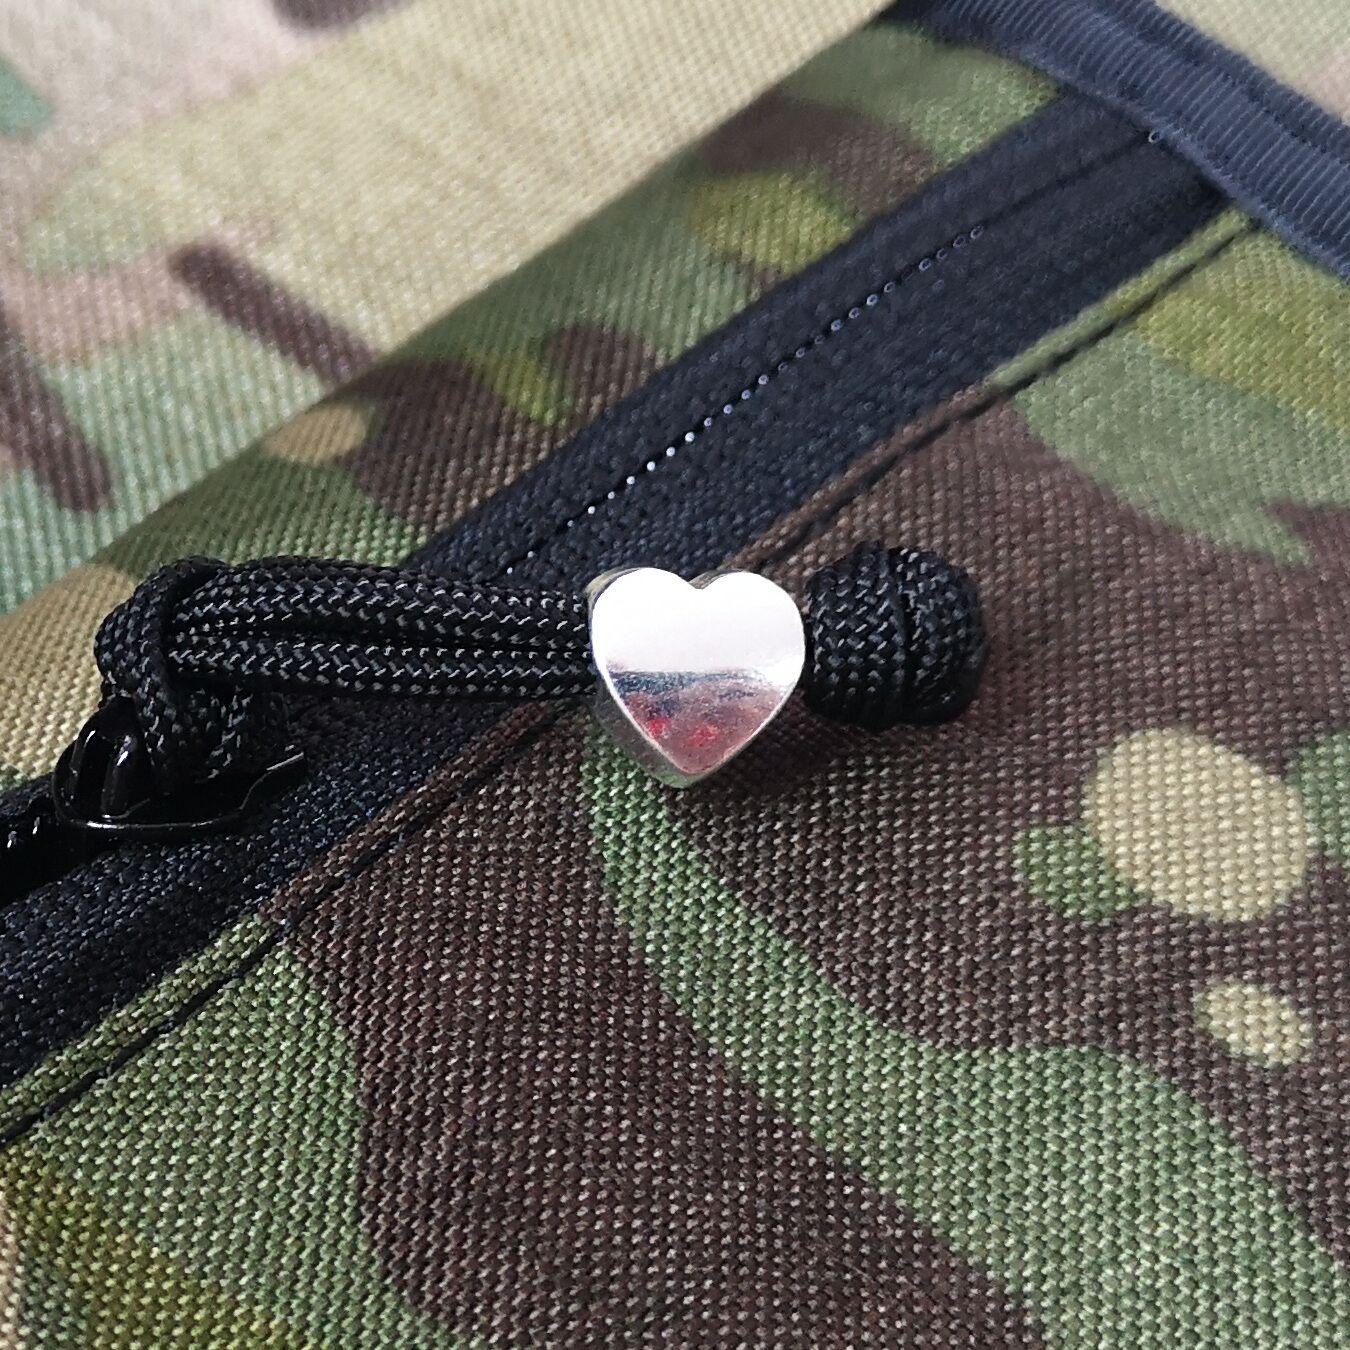 Srebrne serce +3pln